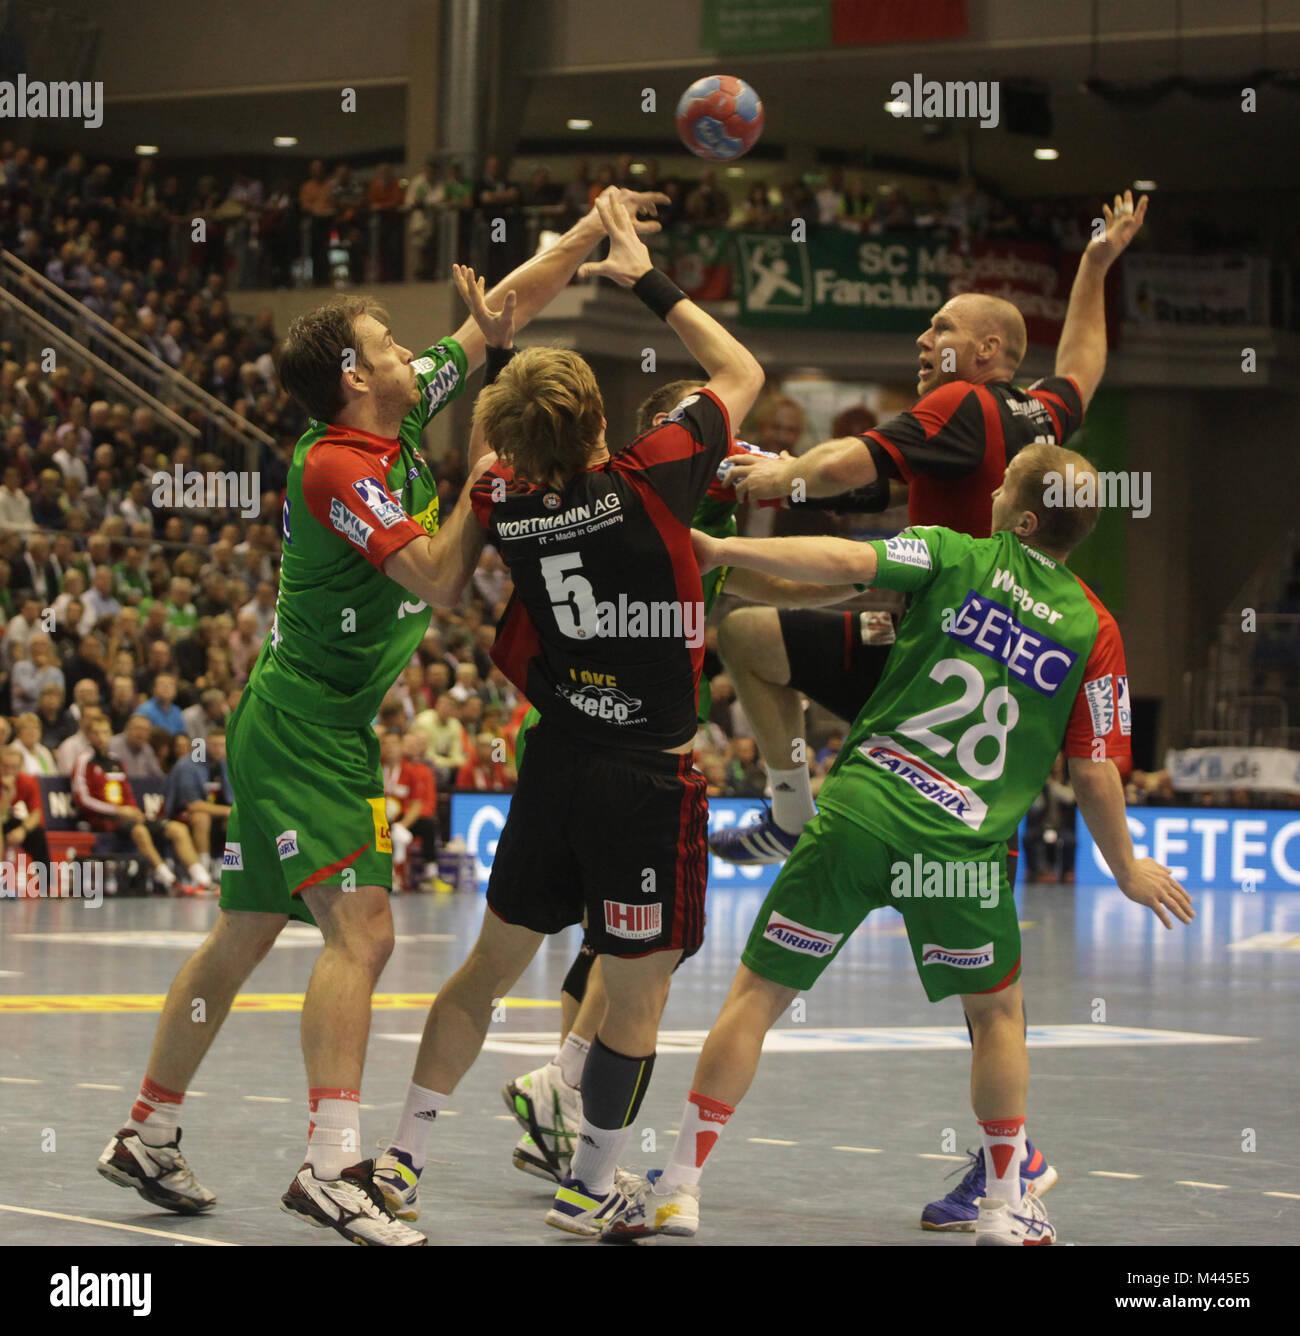 DKB Handball-Bundesliga 2013-2014, 11. Spieltag, SC Magdeburg-TUS N-Lübbecke - Stock Image